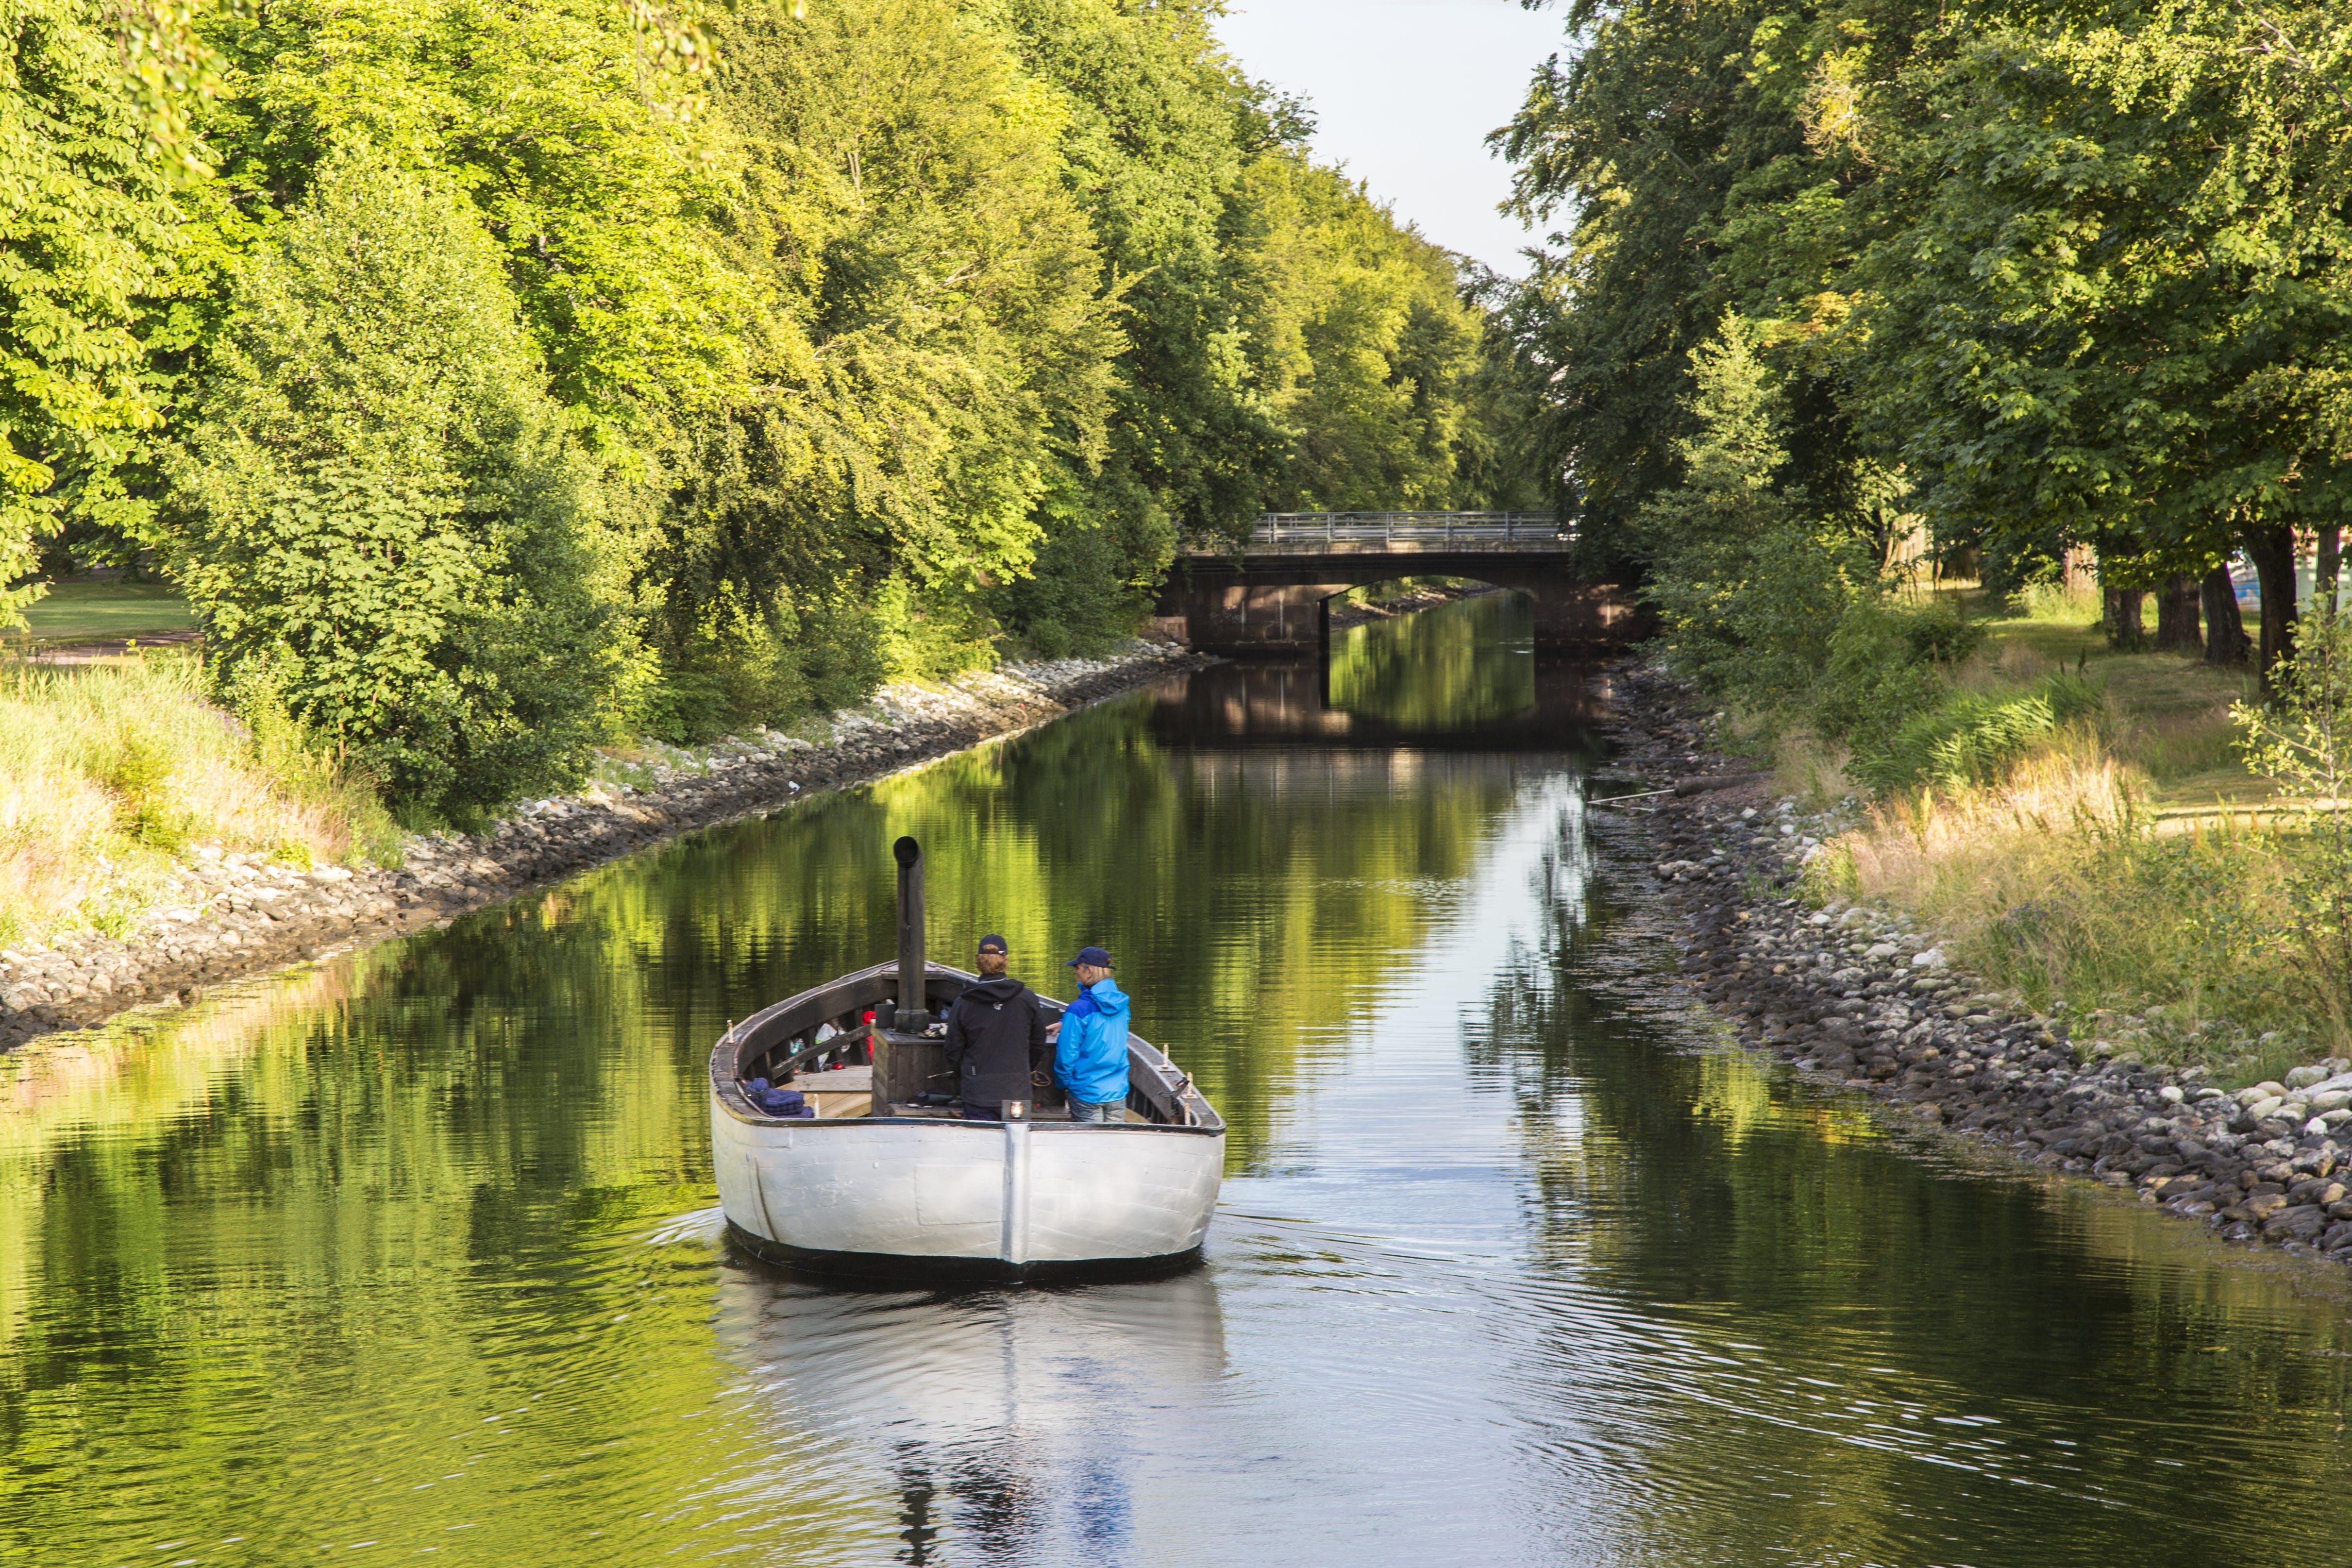 Gratis lagerfoto af båd, kanal